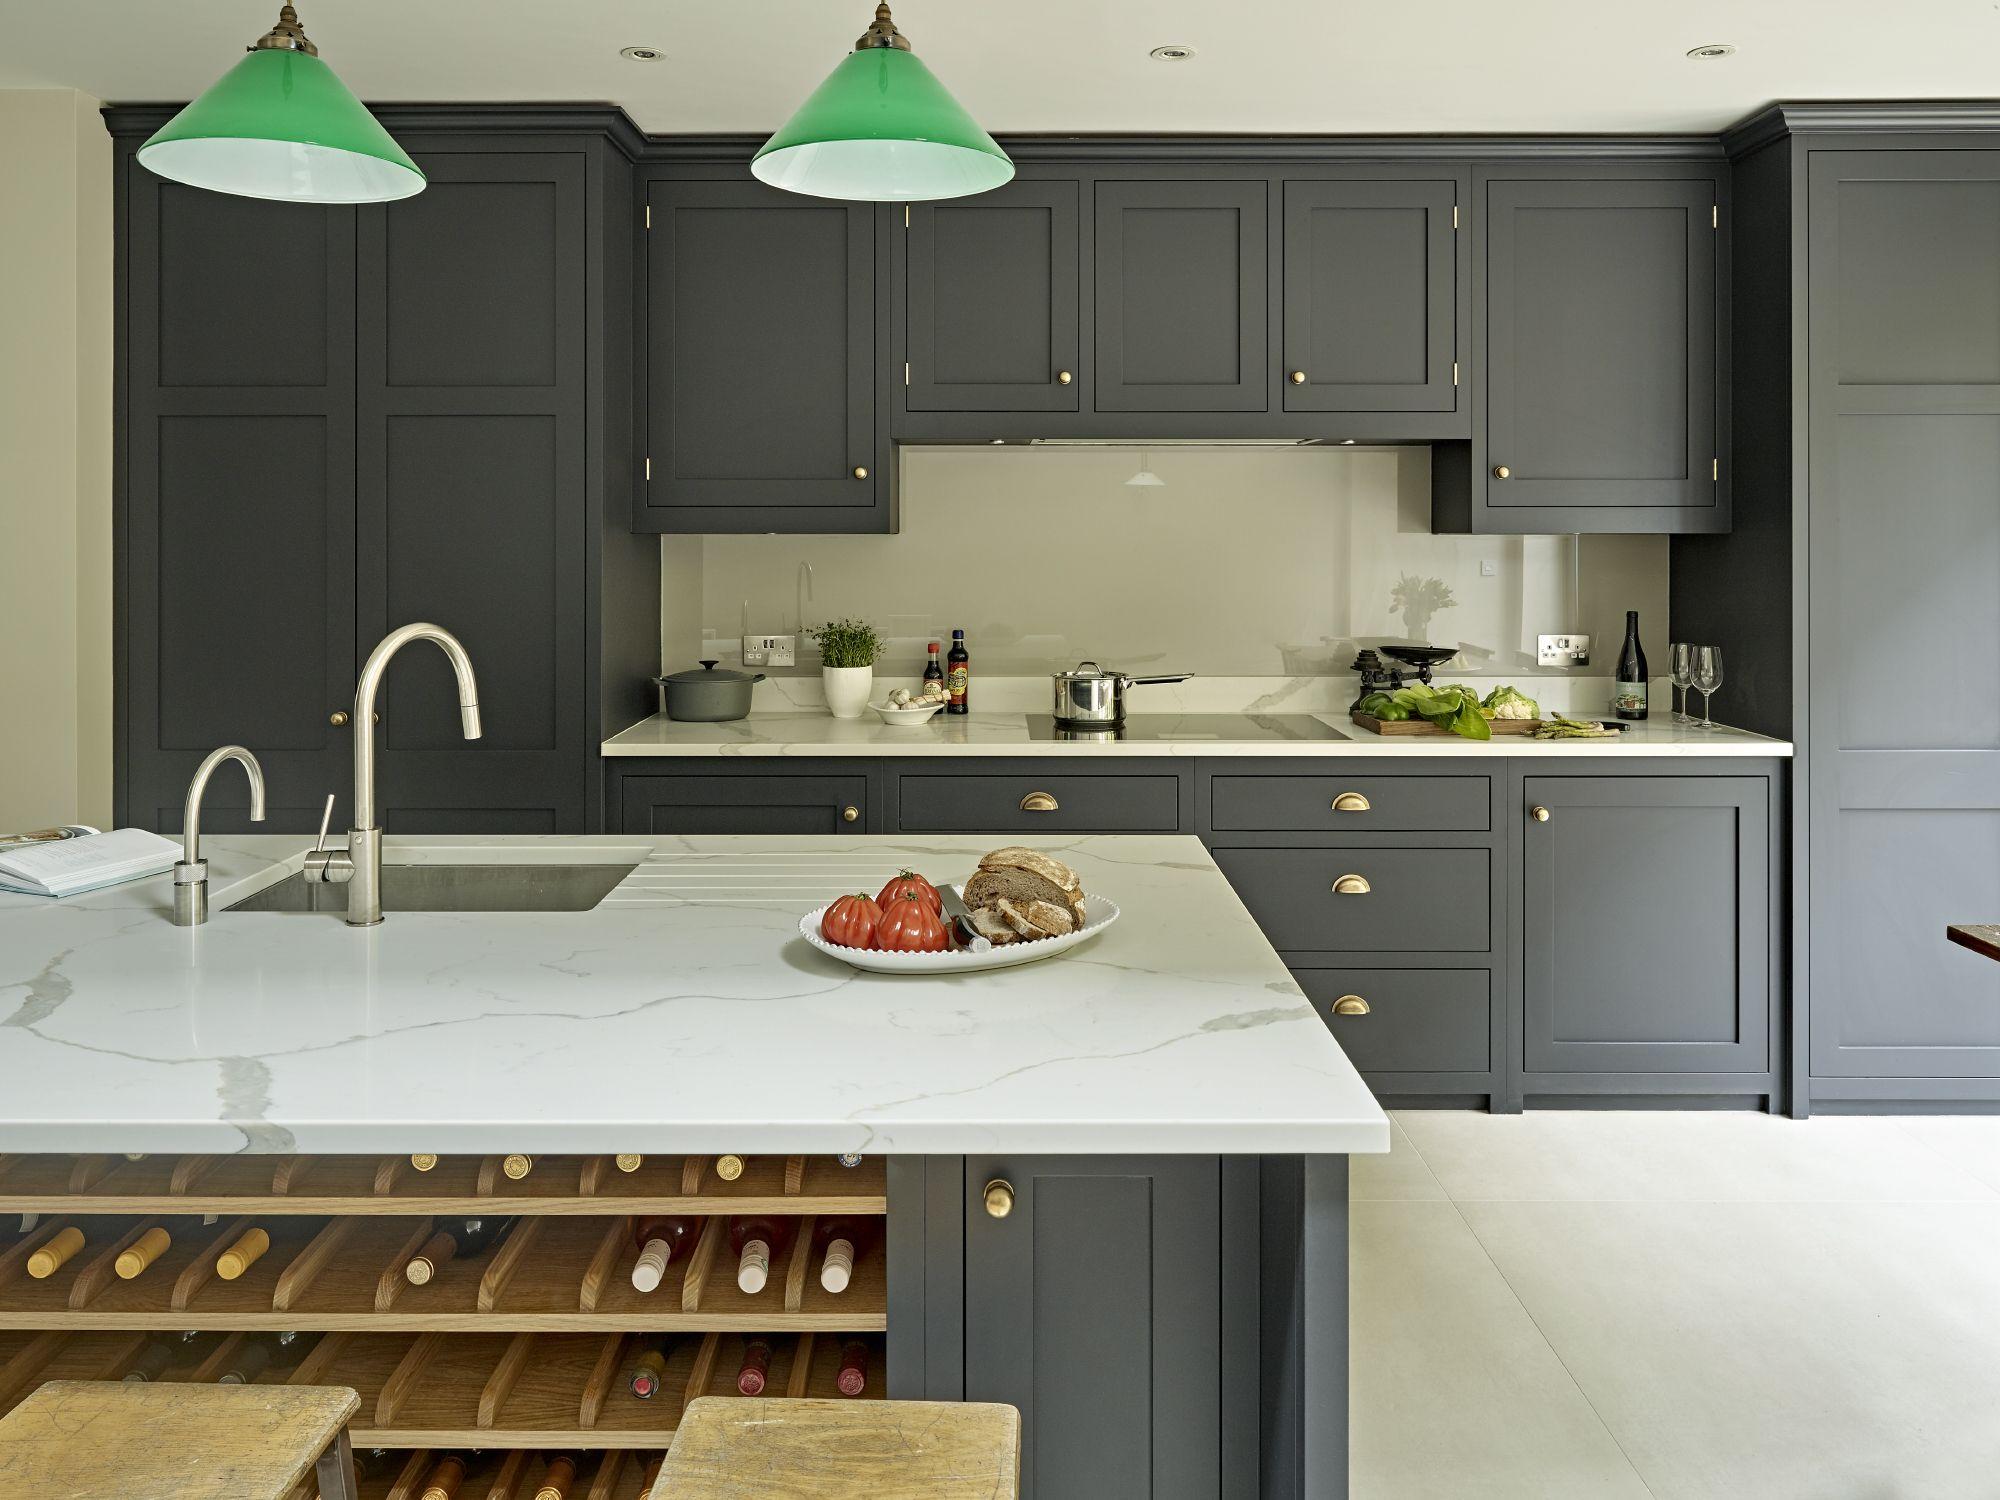 Best Kitchen Gallery: Battersea Kitchen Luxury Fitted Kitchens In Sw London Brass of Burnished Kitchen Cabinets on rachelxblog.com